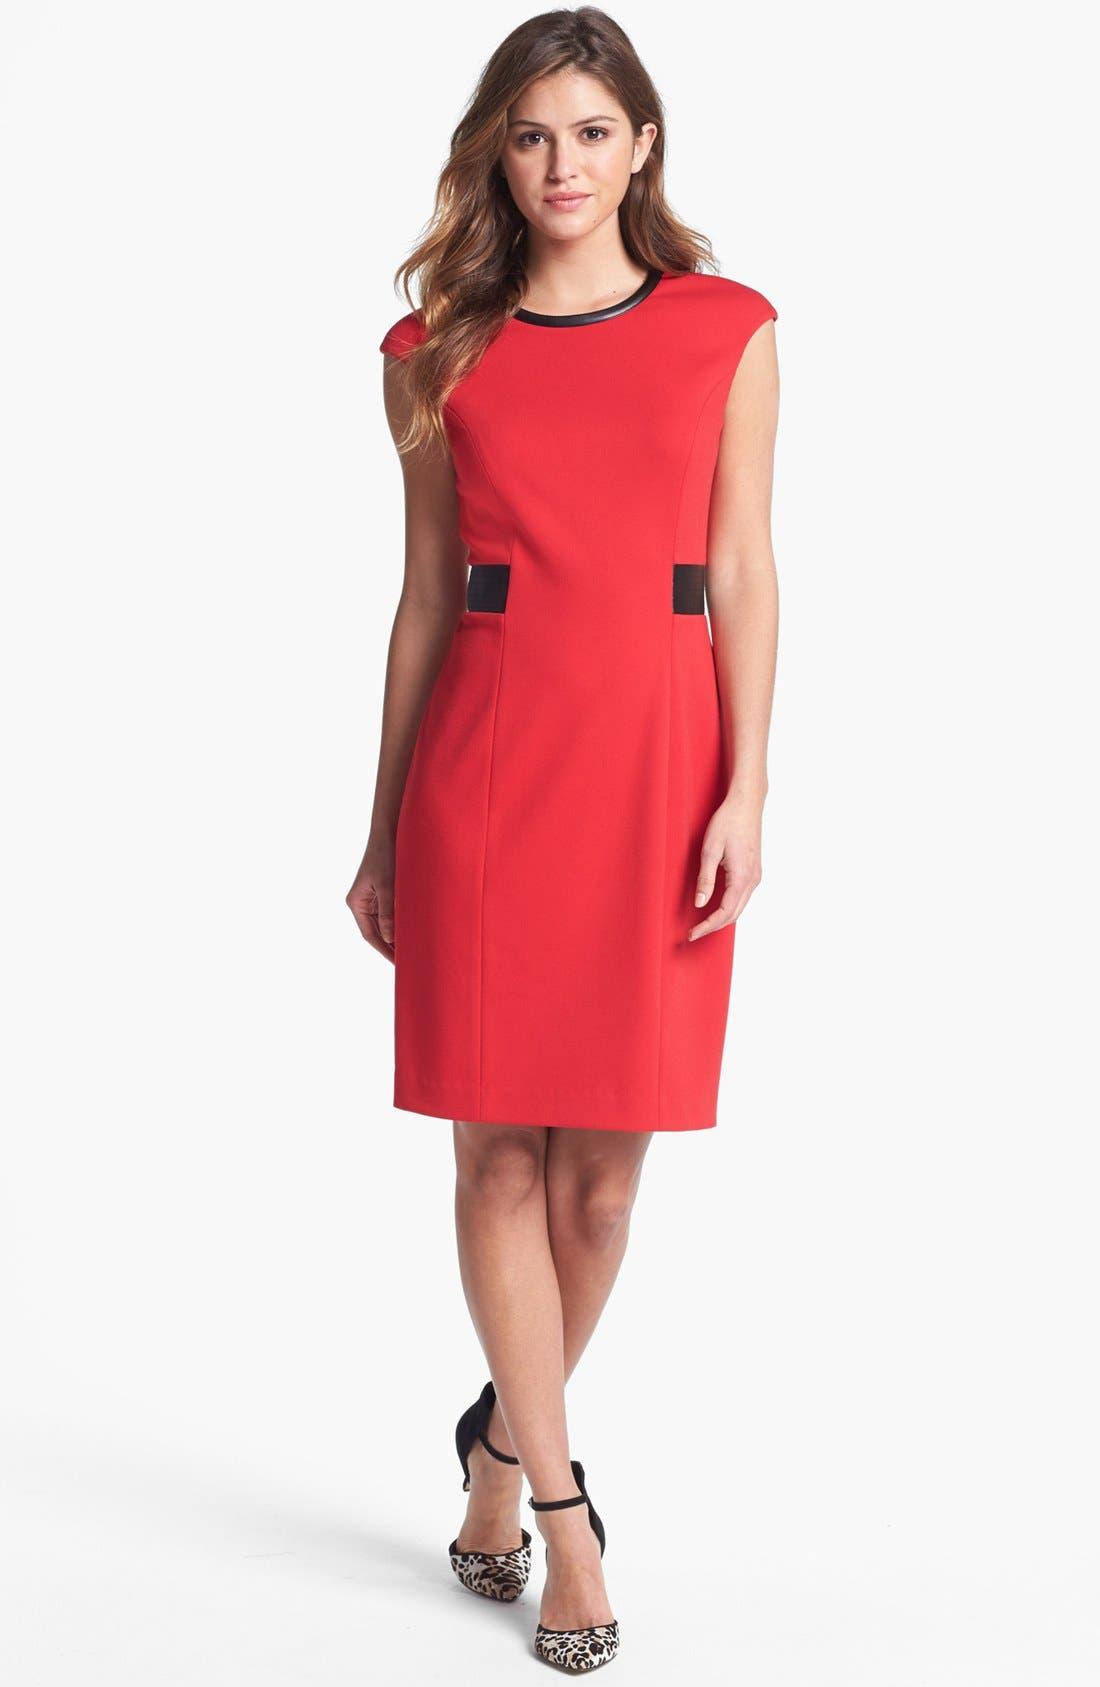 Alternate Image 1 Selected - Calvin Klein Faux Leather Trim Ponte Sheath Dress (Petite)